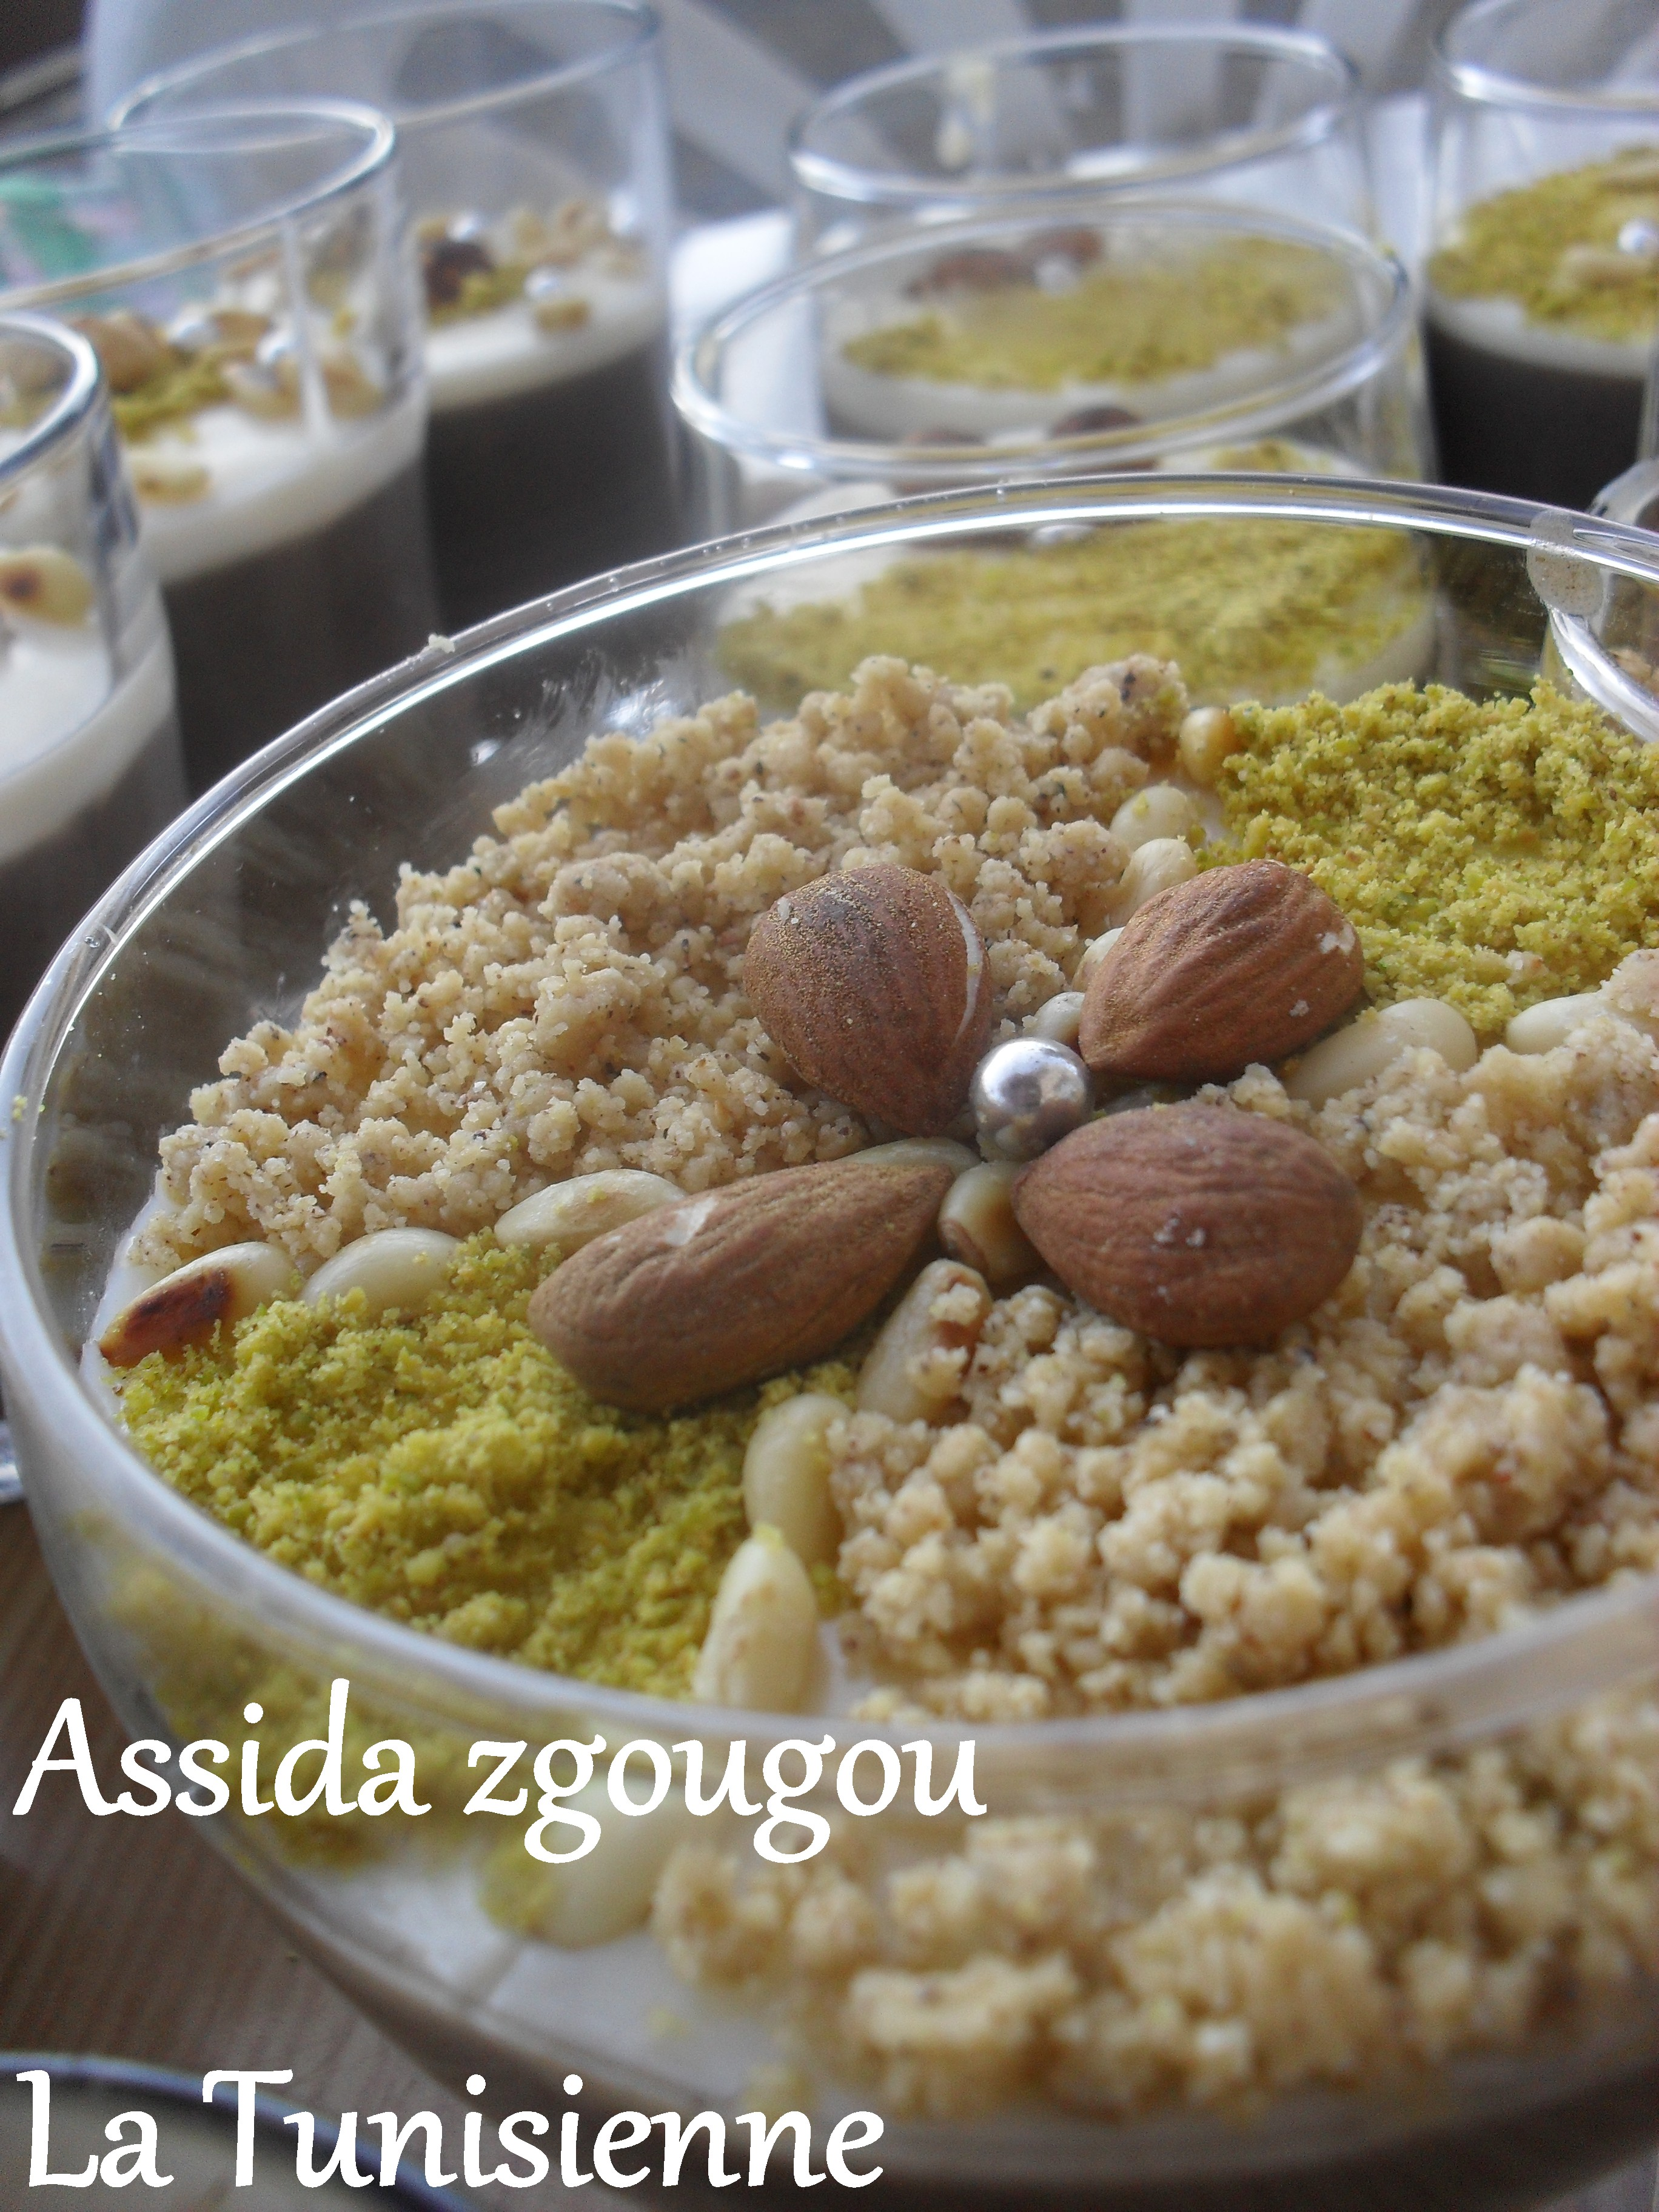 sp cialit tunisienne assida zgougou